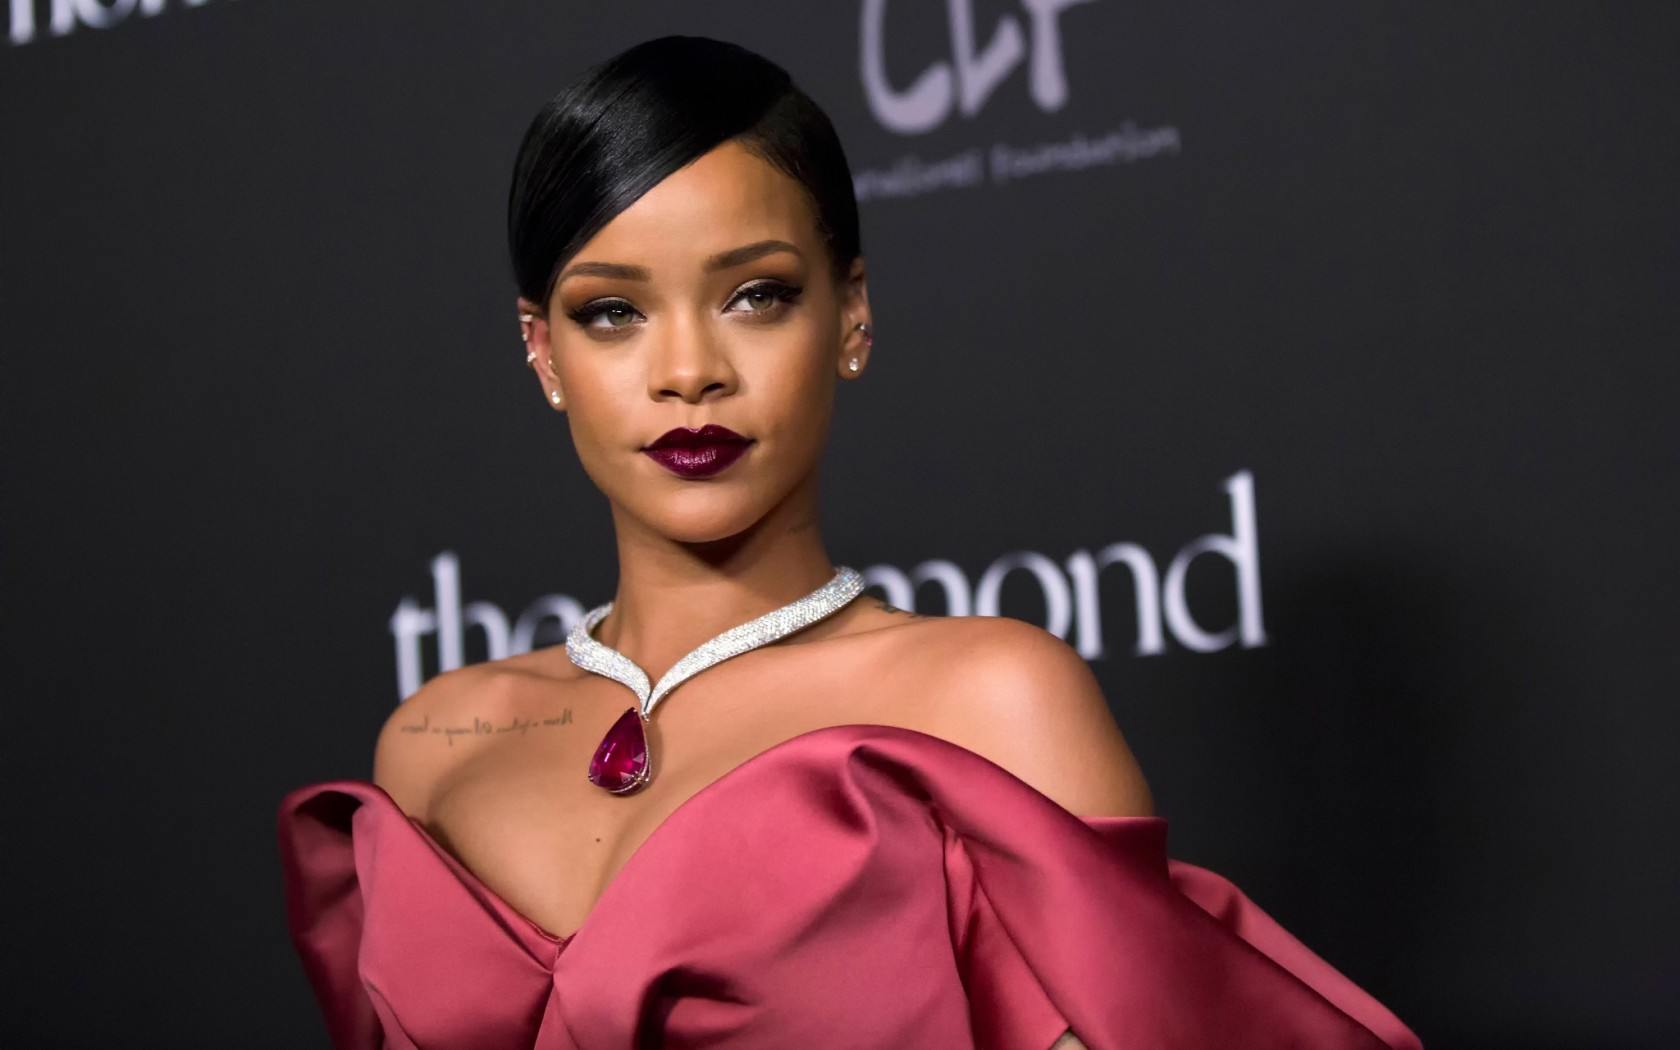 Rihanna 2015 Wallpaper Picture   3   HD Wallpapers Desktop Wallpaper 1680x1050